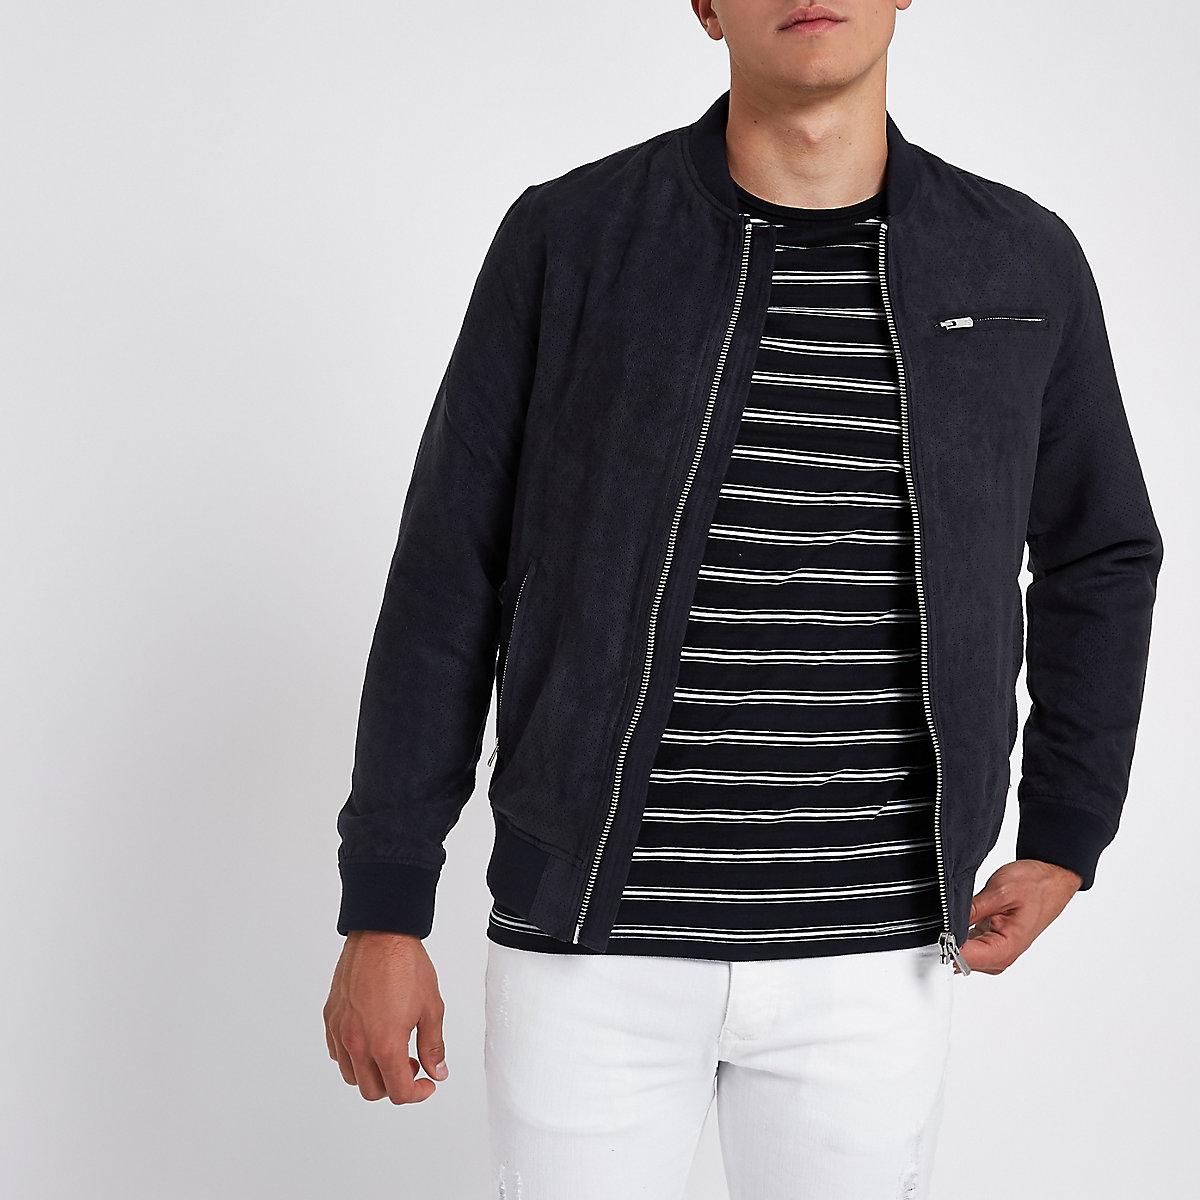 Jack & Jones navy bomber jacket